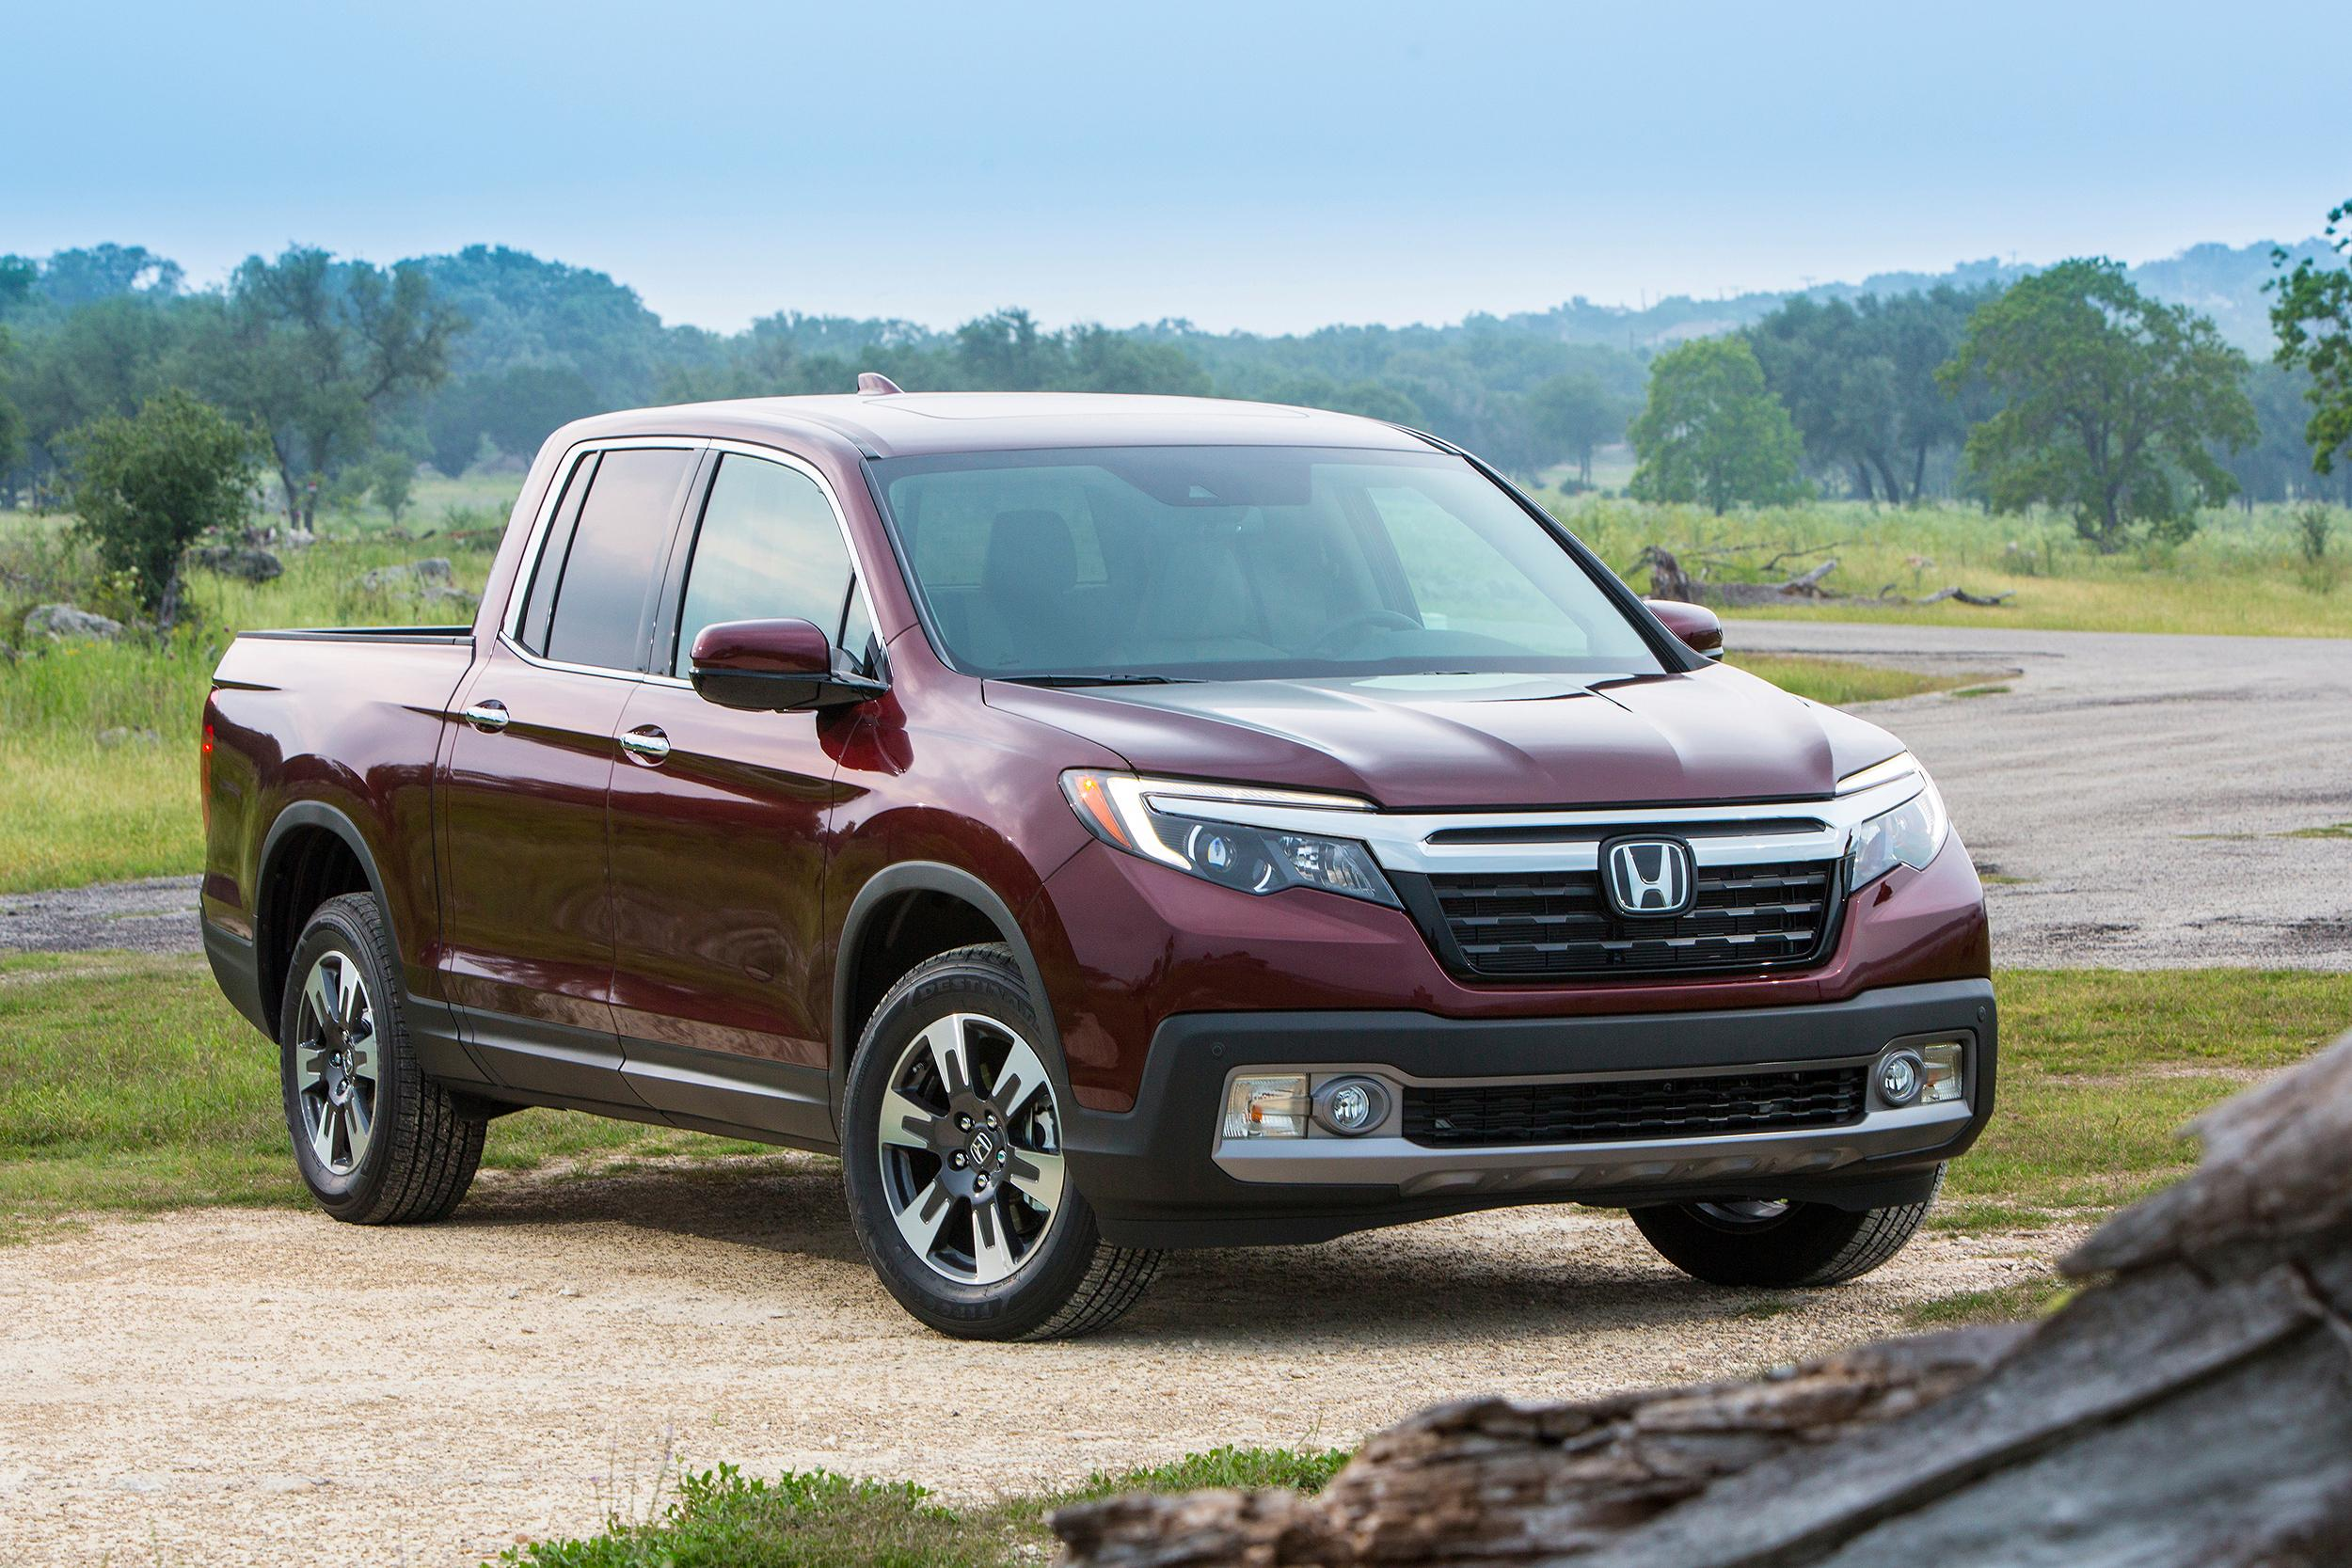 Hondau0027s Unibody Ridgeline Has Reignited Industry Speculation That Next Gen  Midsize Pickups Wonu0027t Be Based On Traditional Truck Platforms. (Photo: Honda )